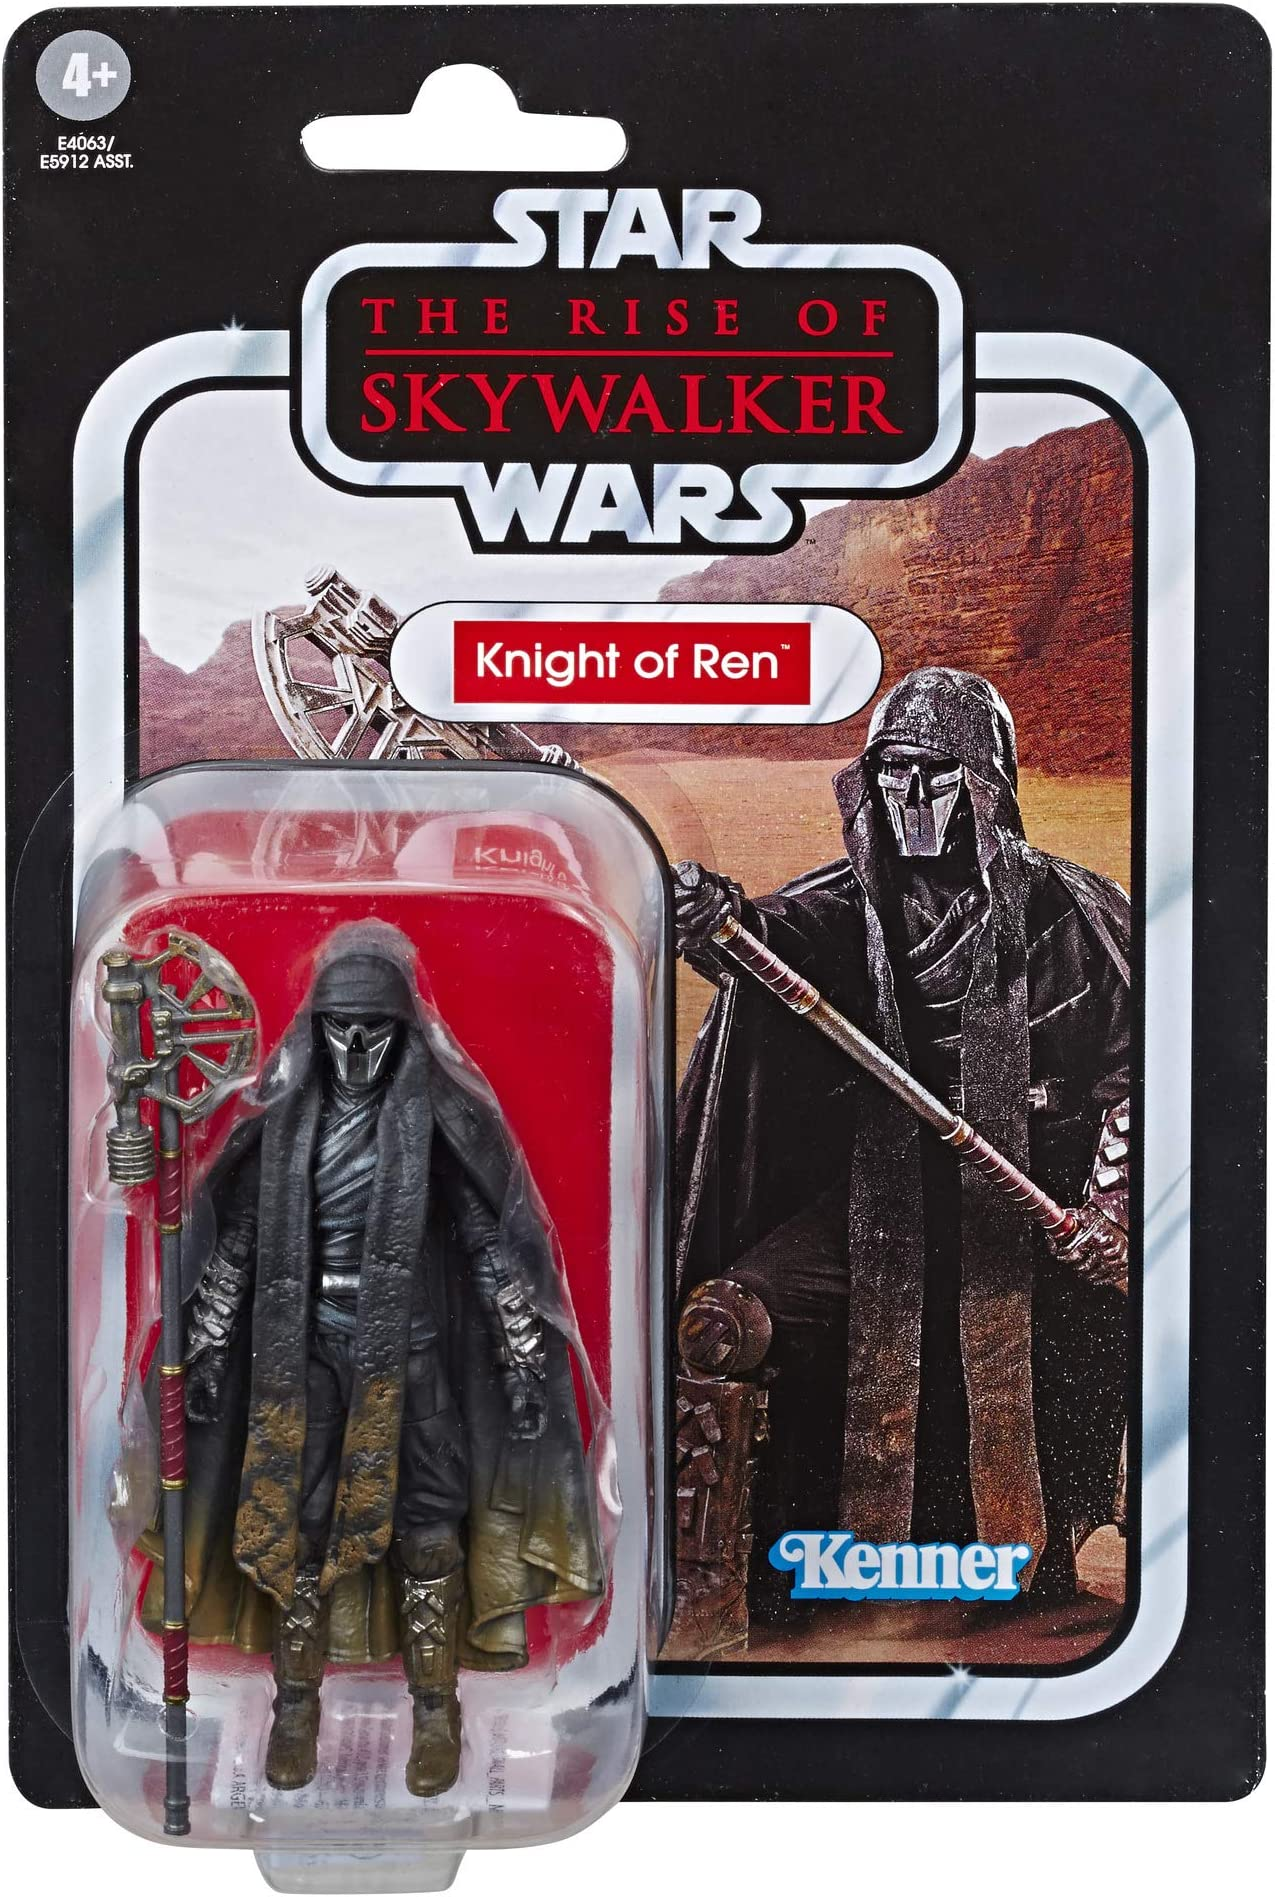 Dans la Main Star Wars The Vintage Collection 2021 nouvelle vague 1 Darth Vader